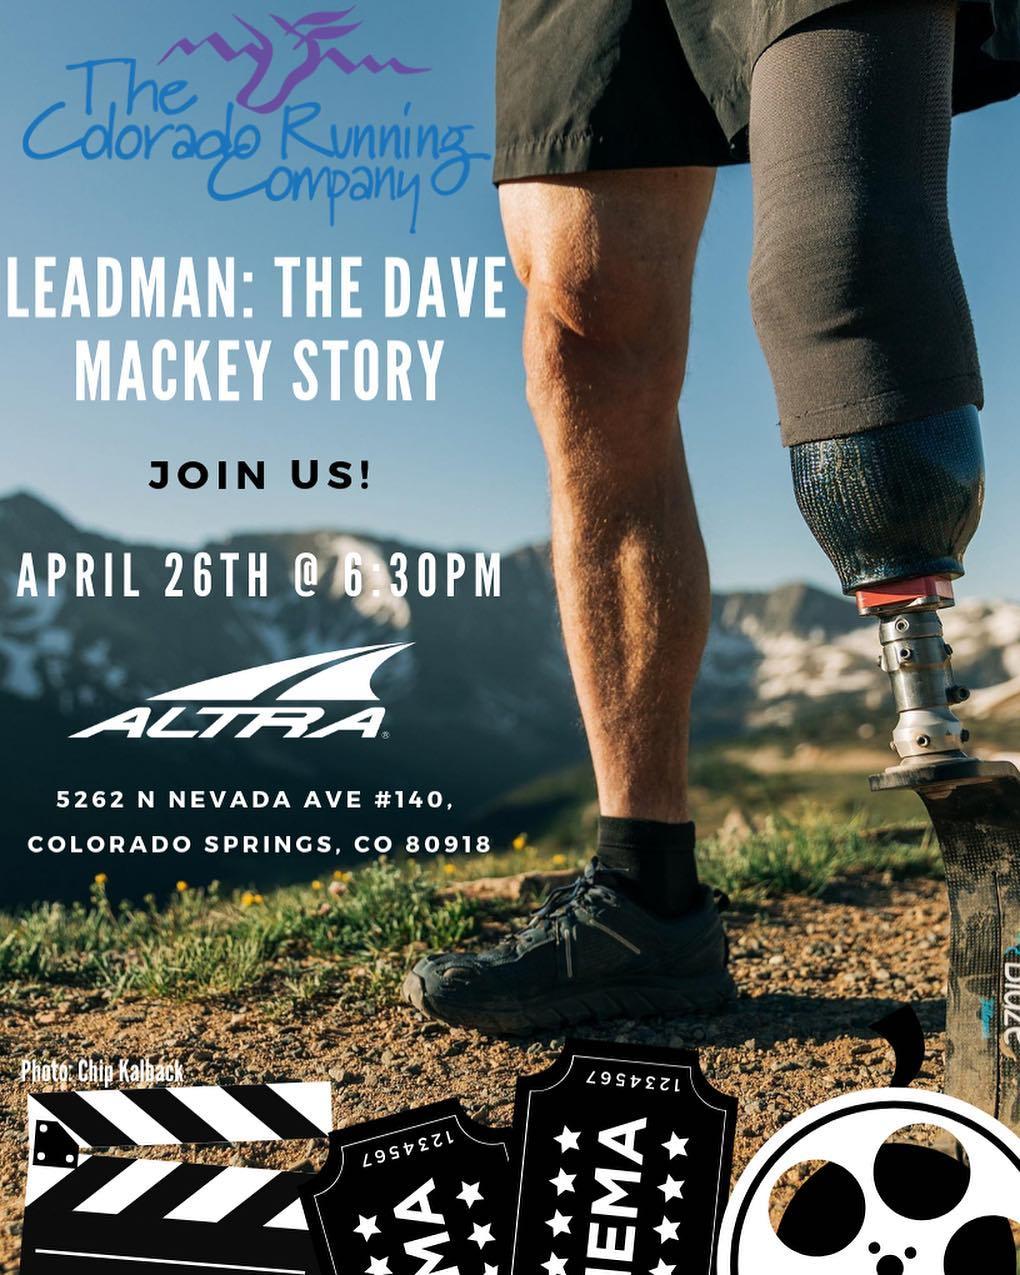 Leadman: The Dave Mackey Story  4/26, 6:30pm